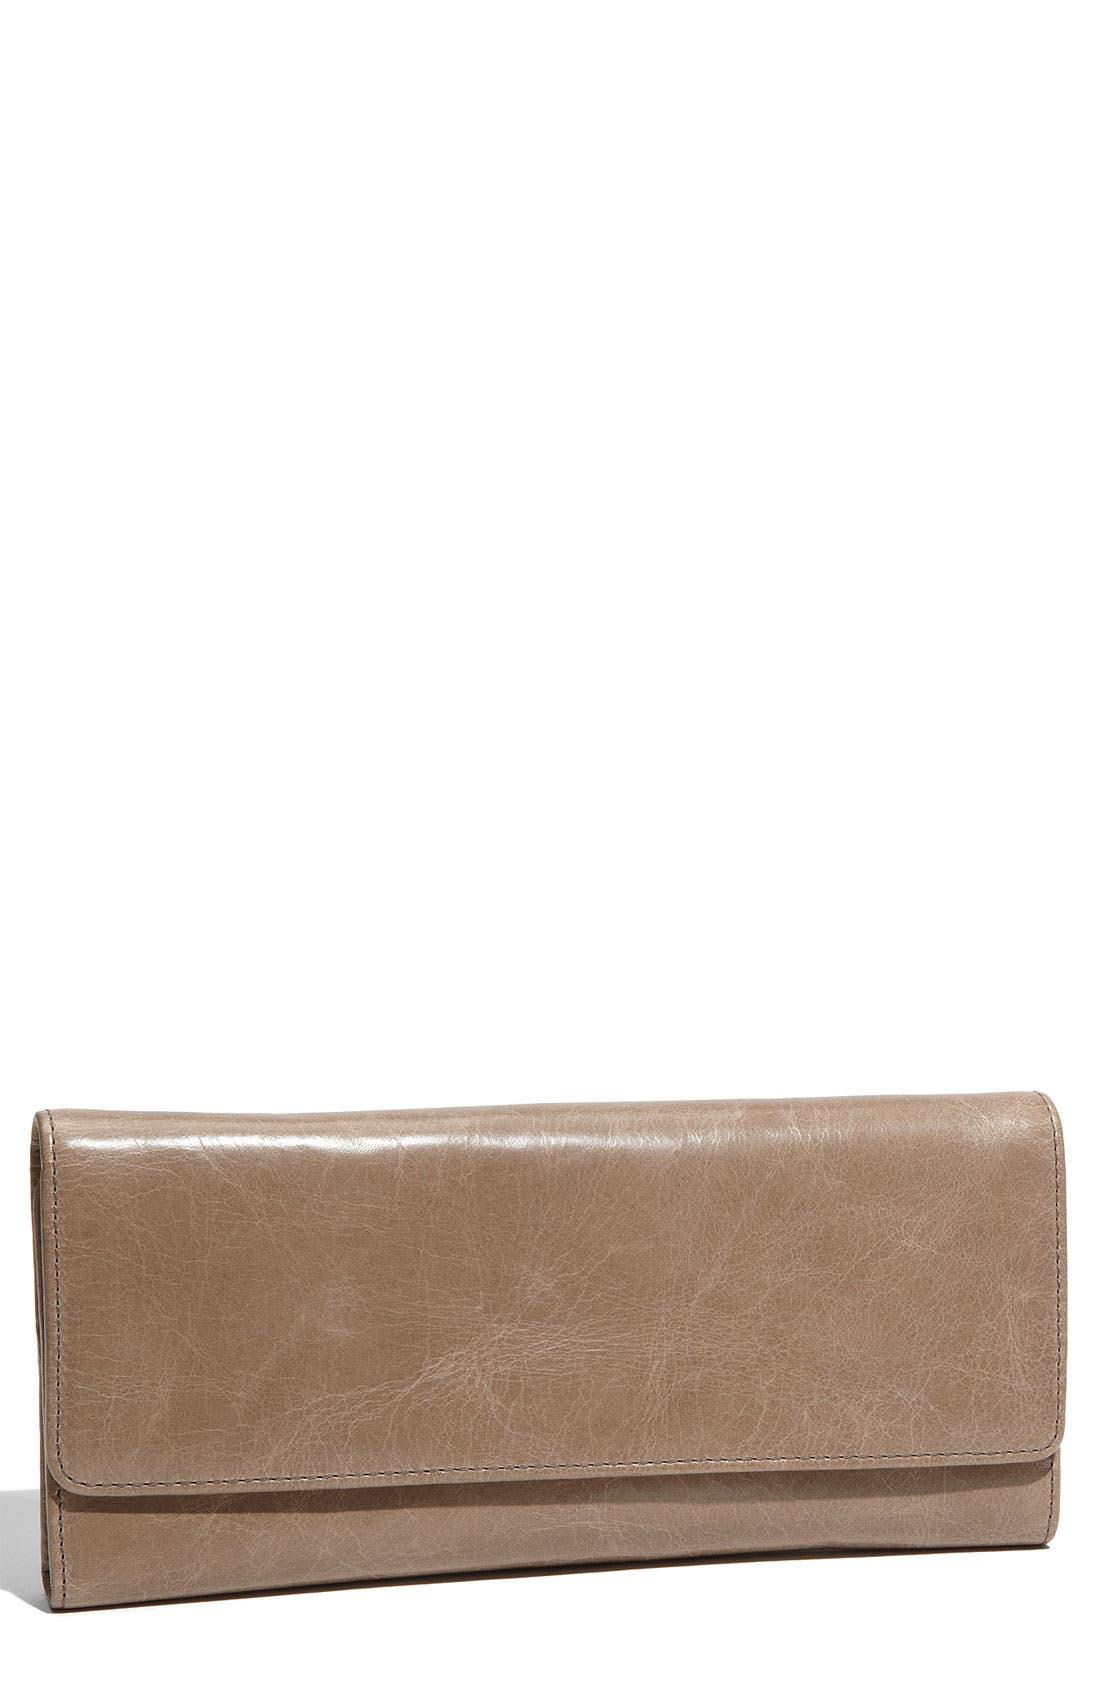 'Sadie' Leather Wallet,                             Main thumbnail 16, color,